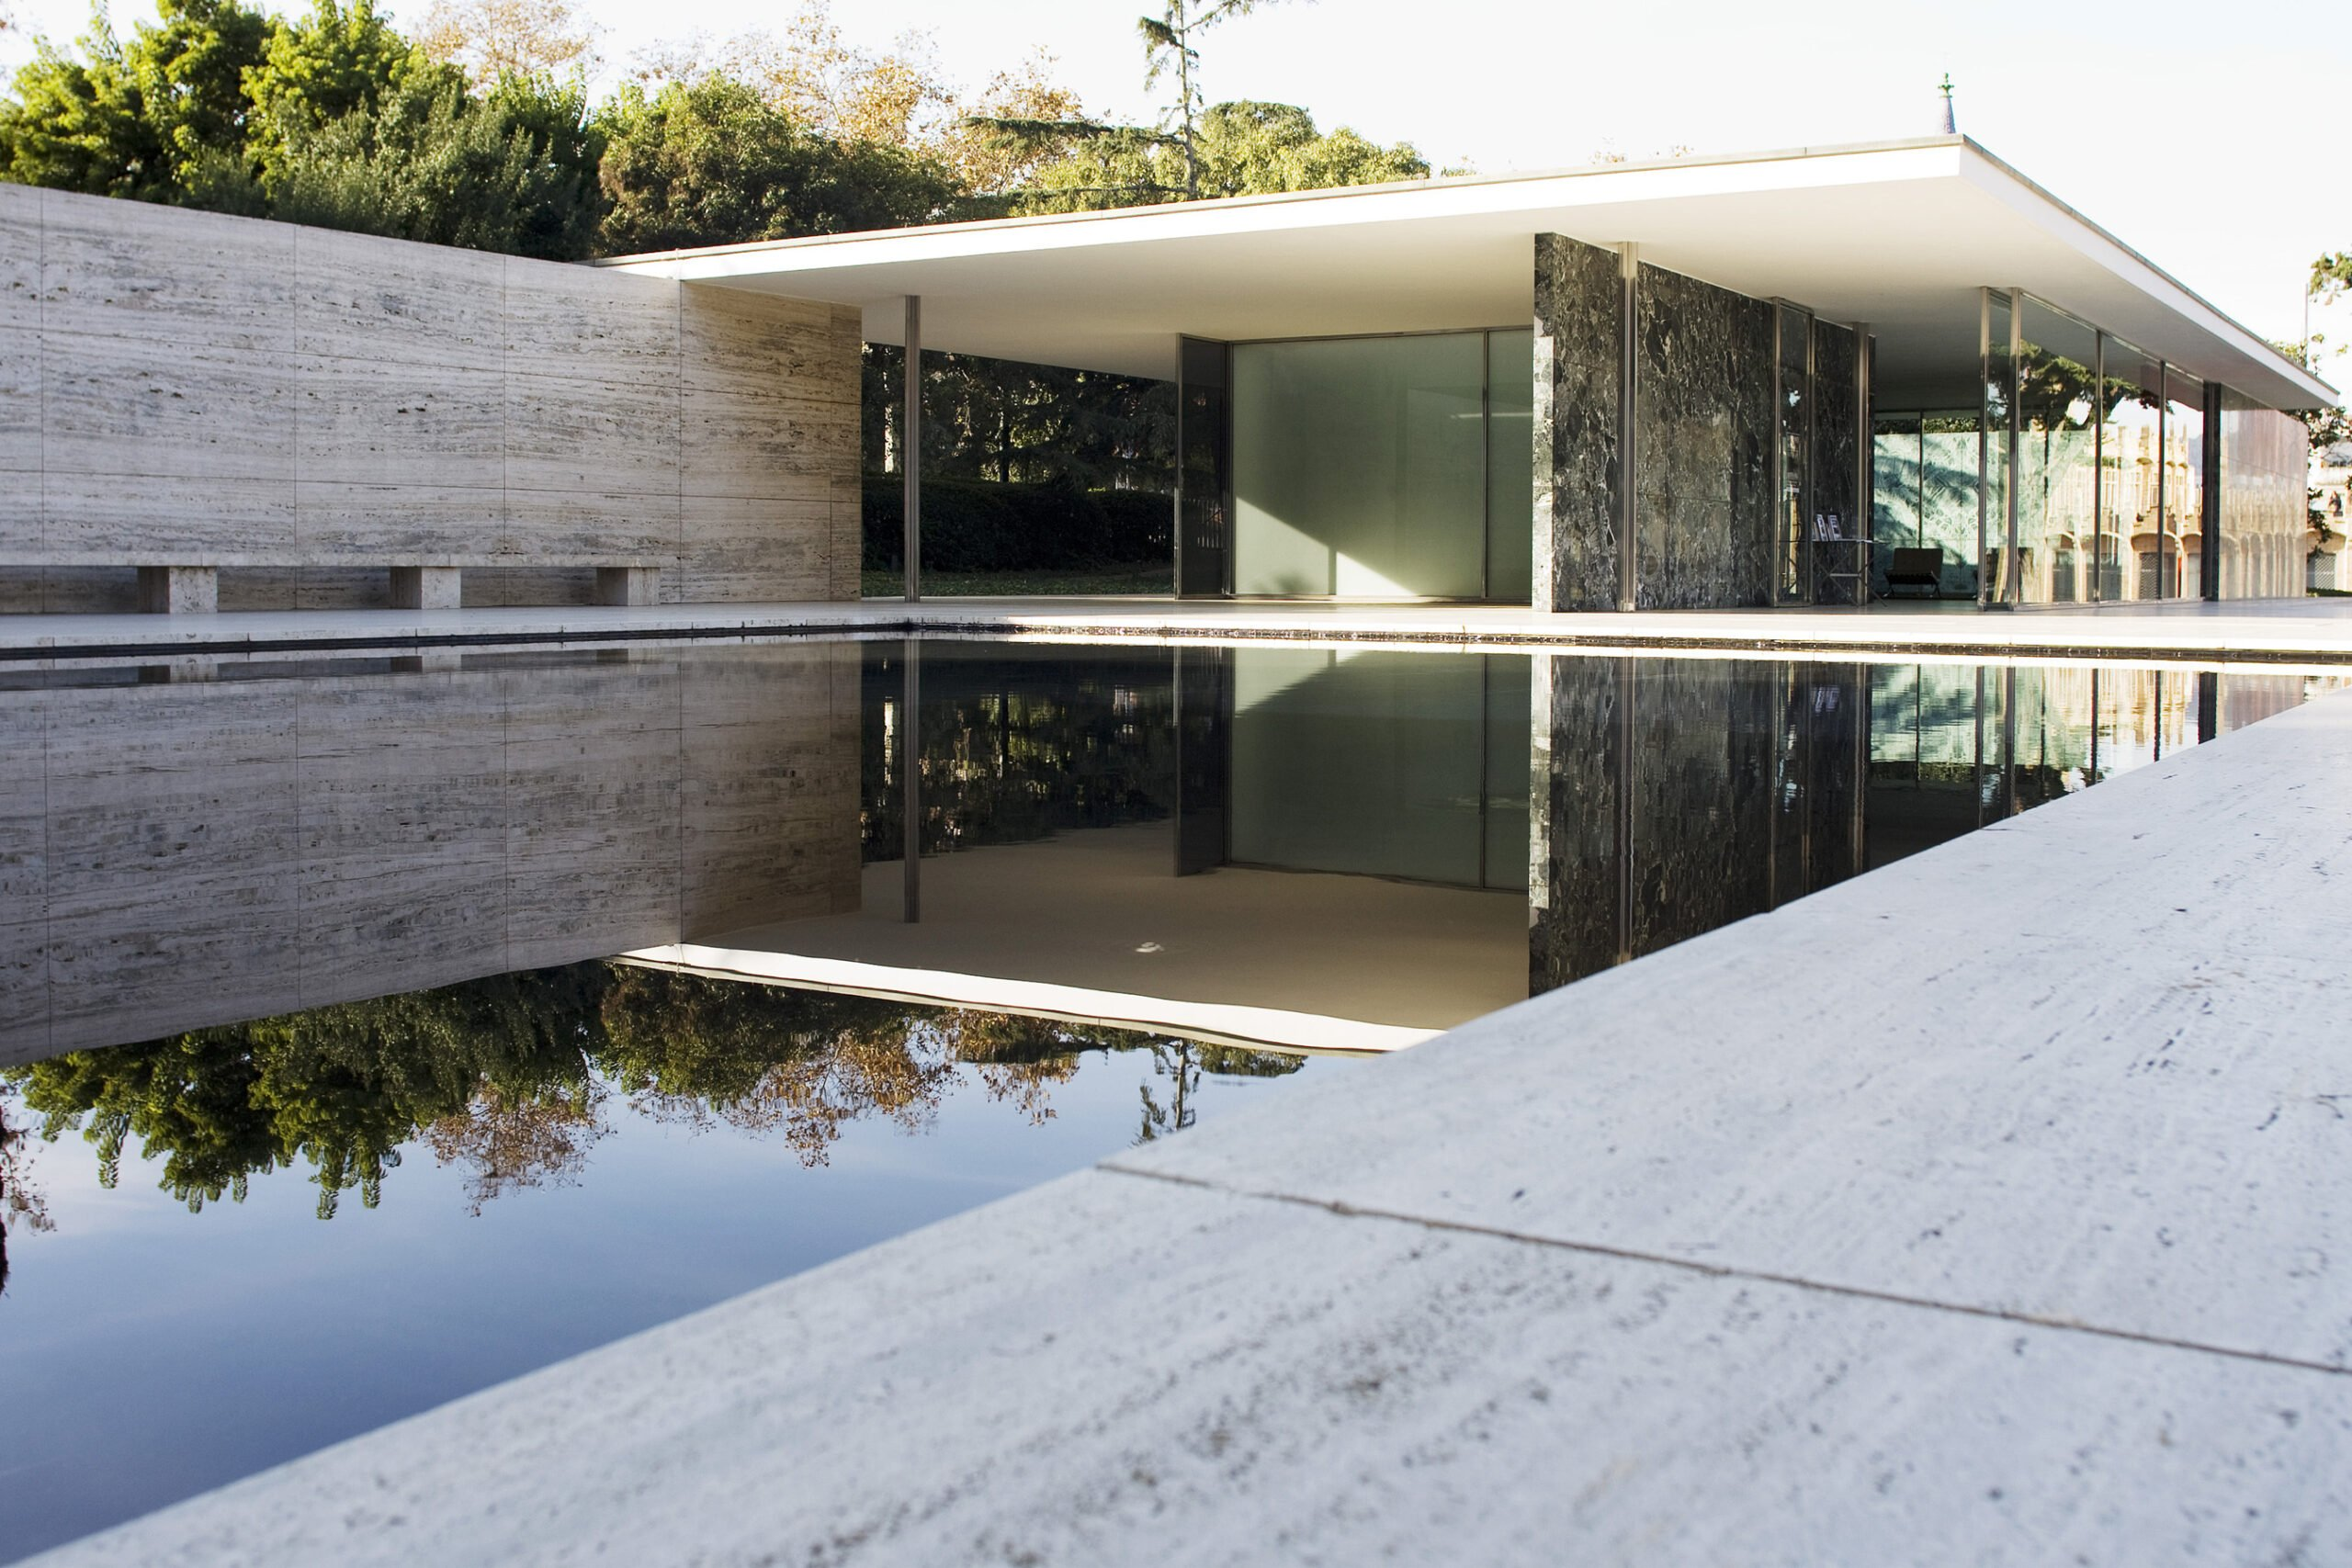 Barcelona Pavilion - a Barcelona Design Guide must-see